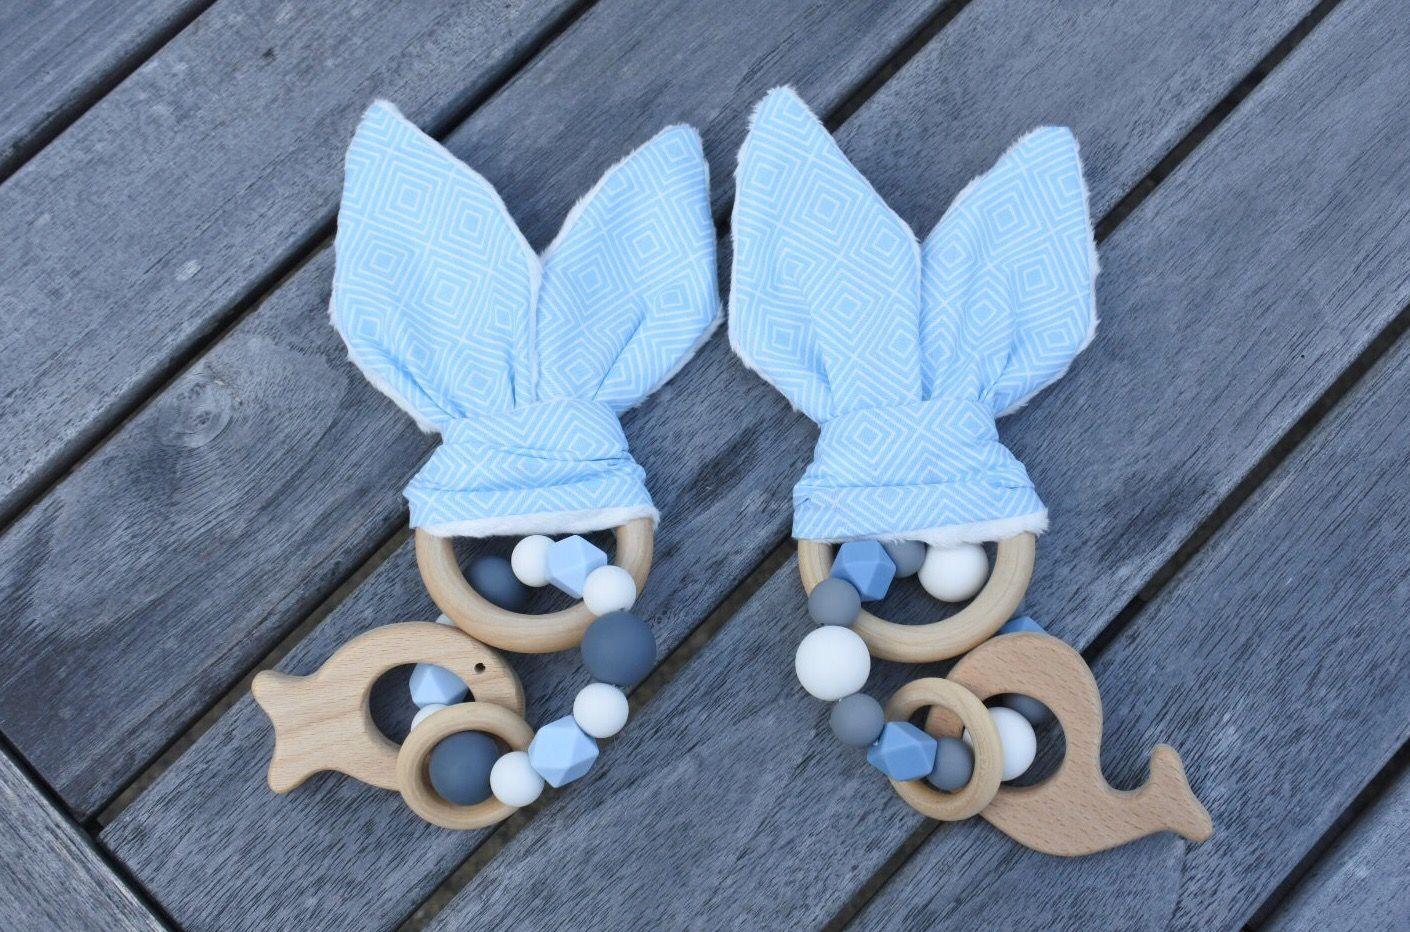 Knisperende konijnenoortjes#2-ling# babyblue# met silicone bijtring# houten hanger